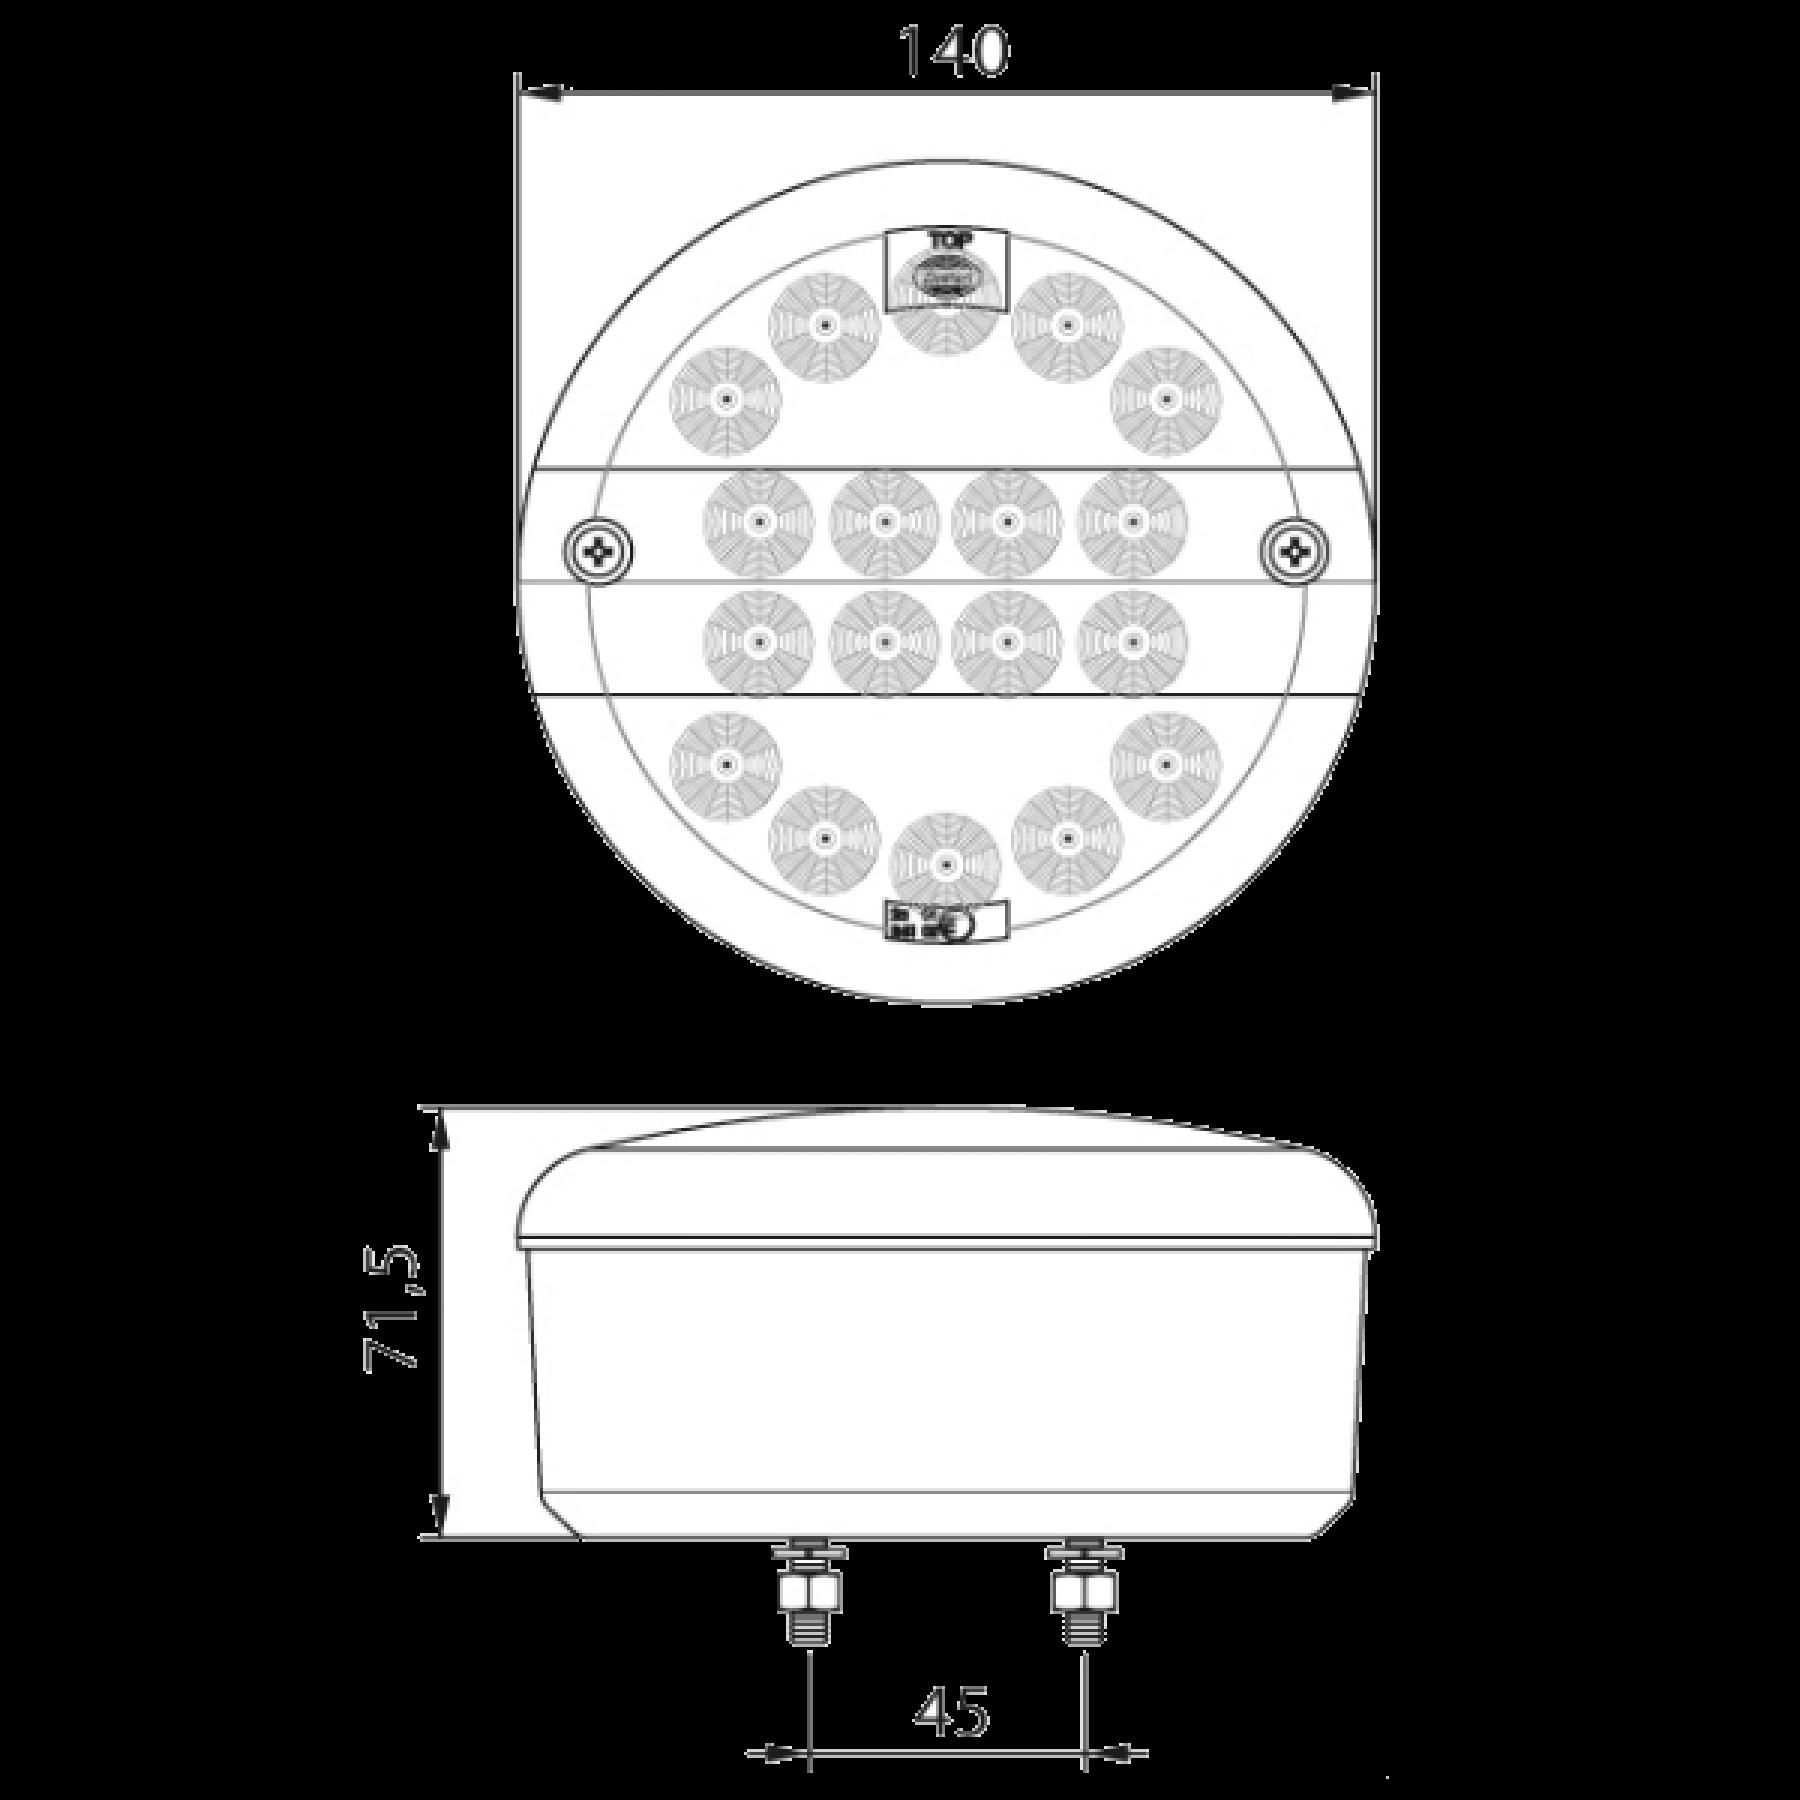 Achterlicht LED rond Ø 140mm (geribb. glas) 12/24v